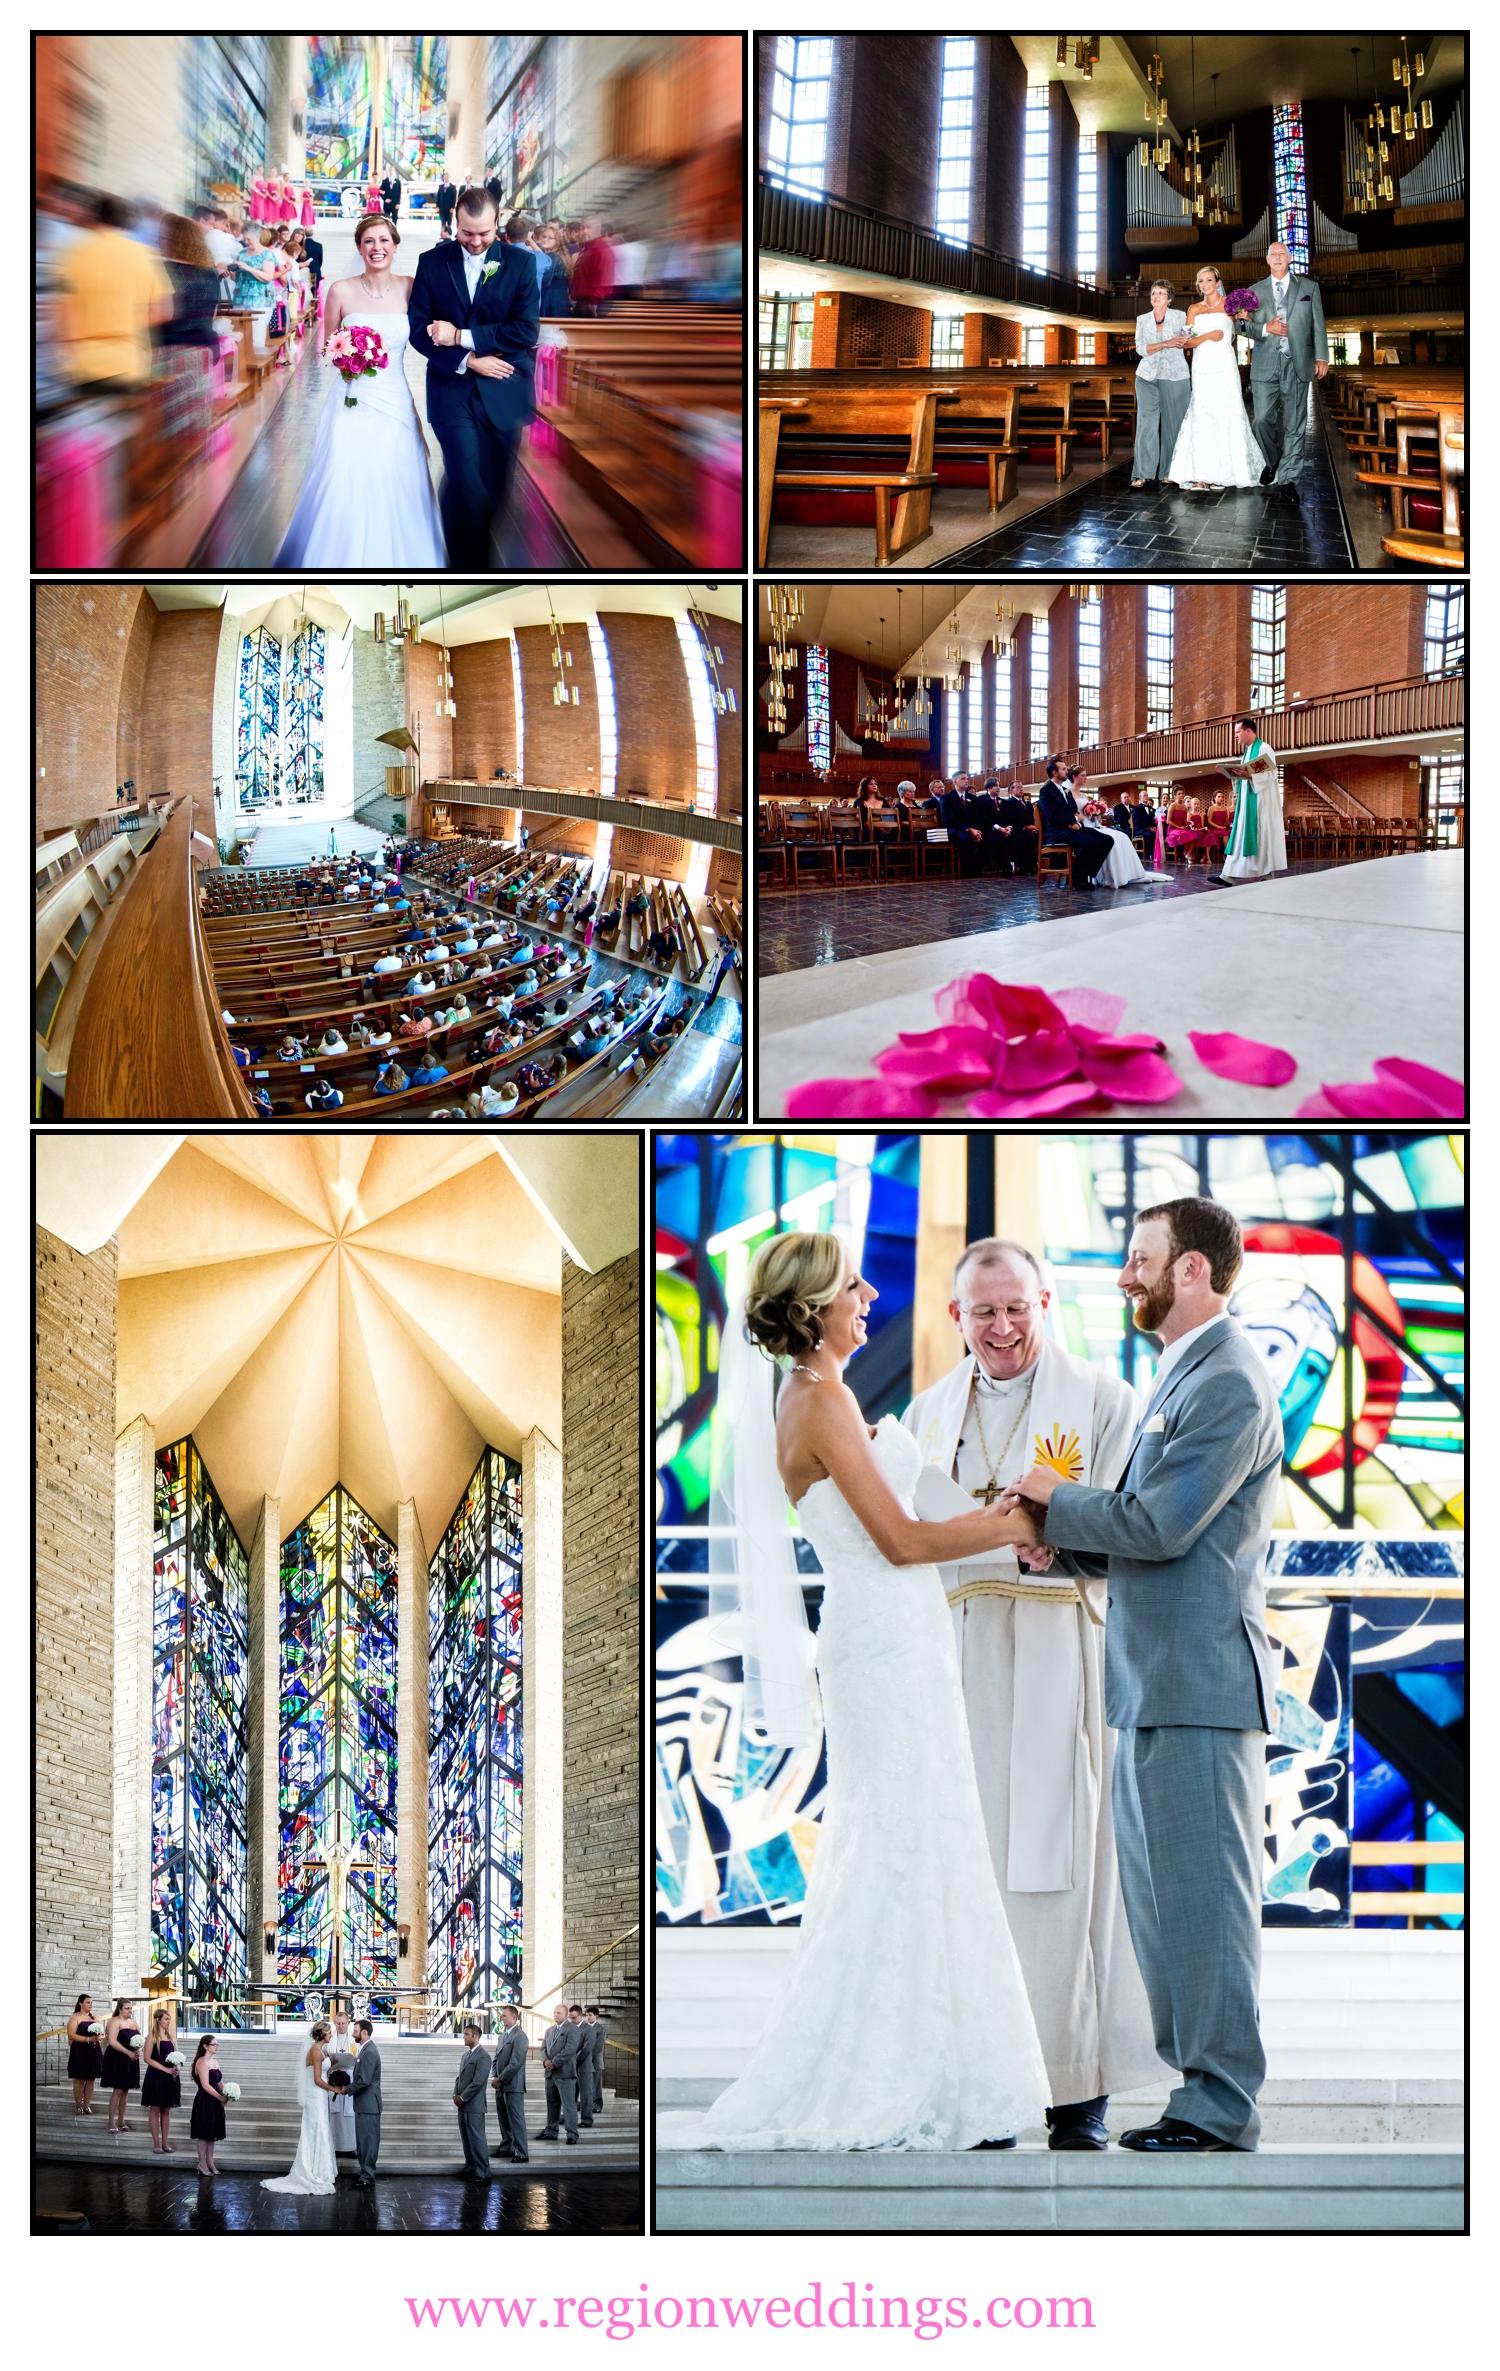 chapel-of-resurrection-wedding-collage.jpg